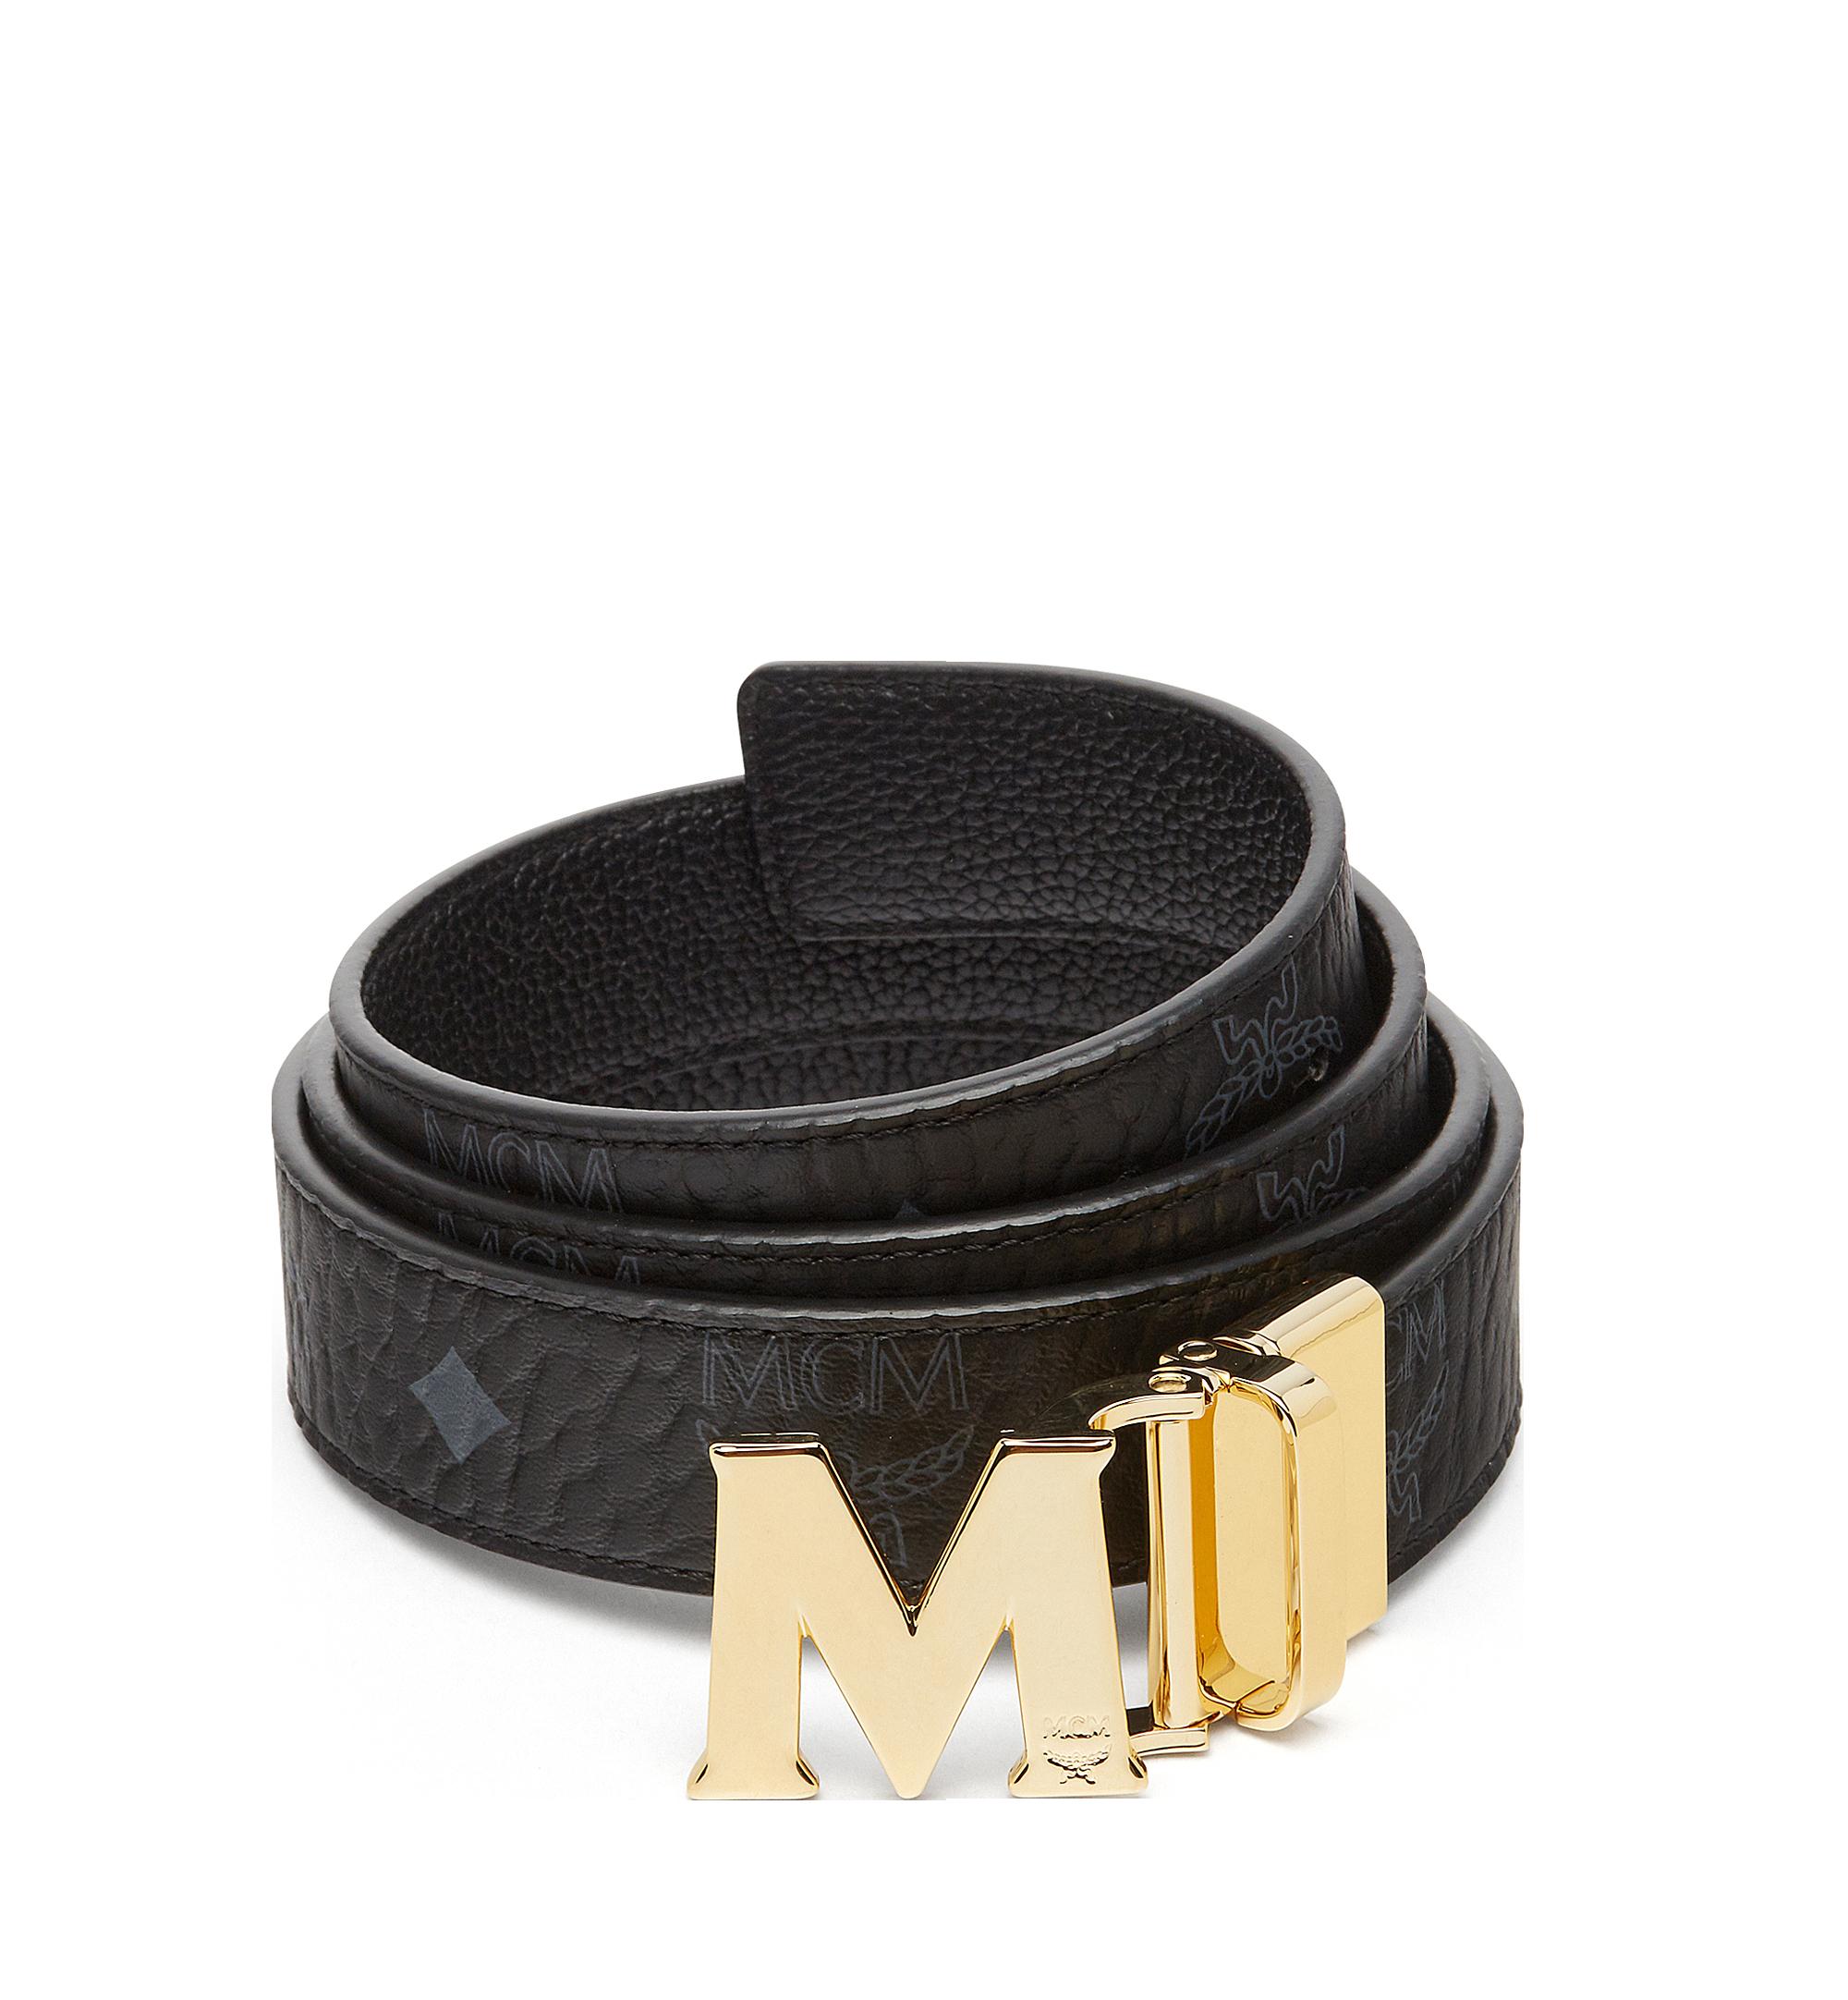 MCM Claus M Reversible Belt 3 cm in Visetos Black MYB7SVC09BK001 Alternate View 1